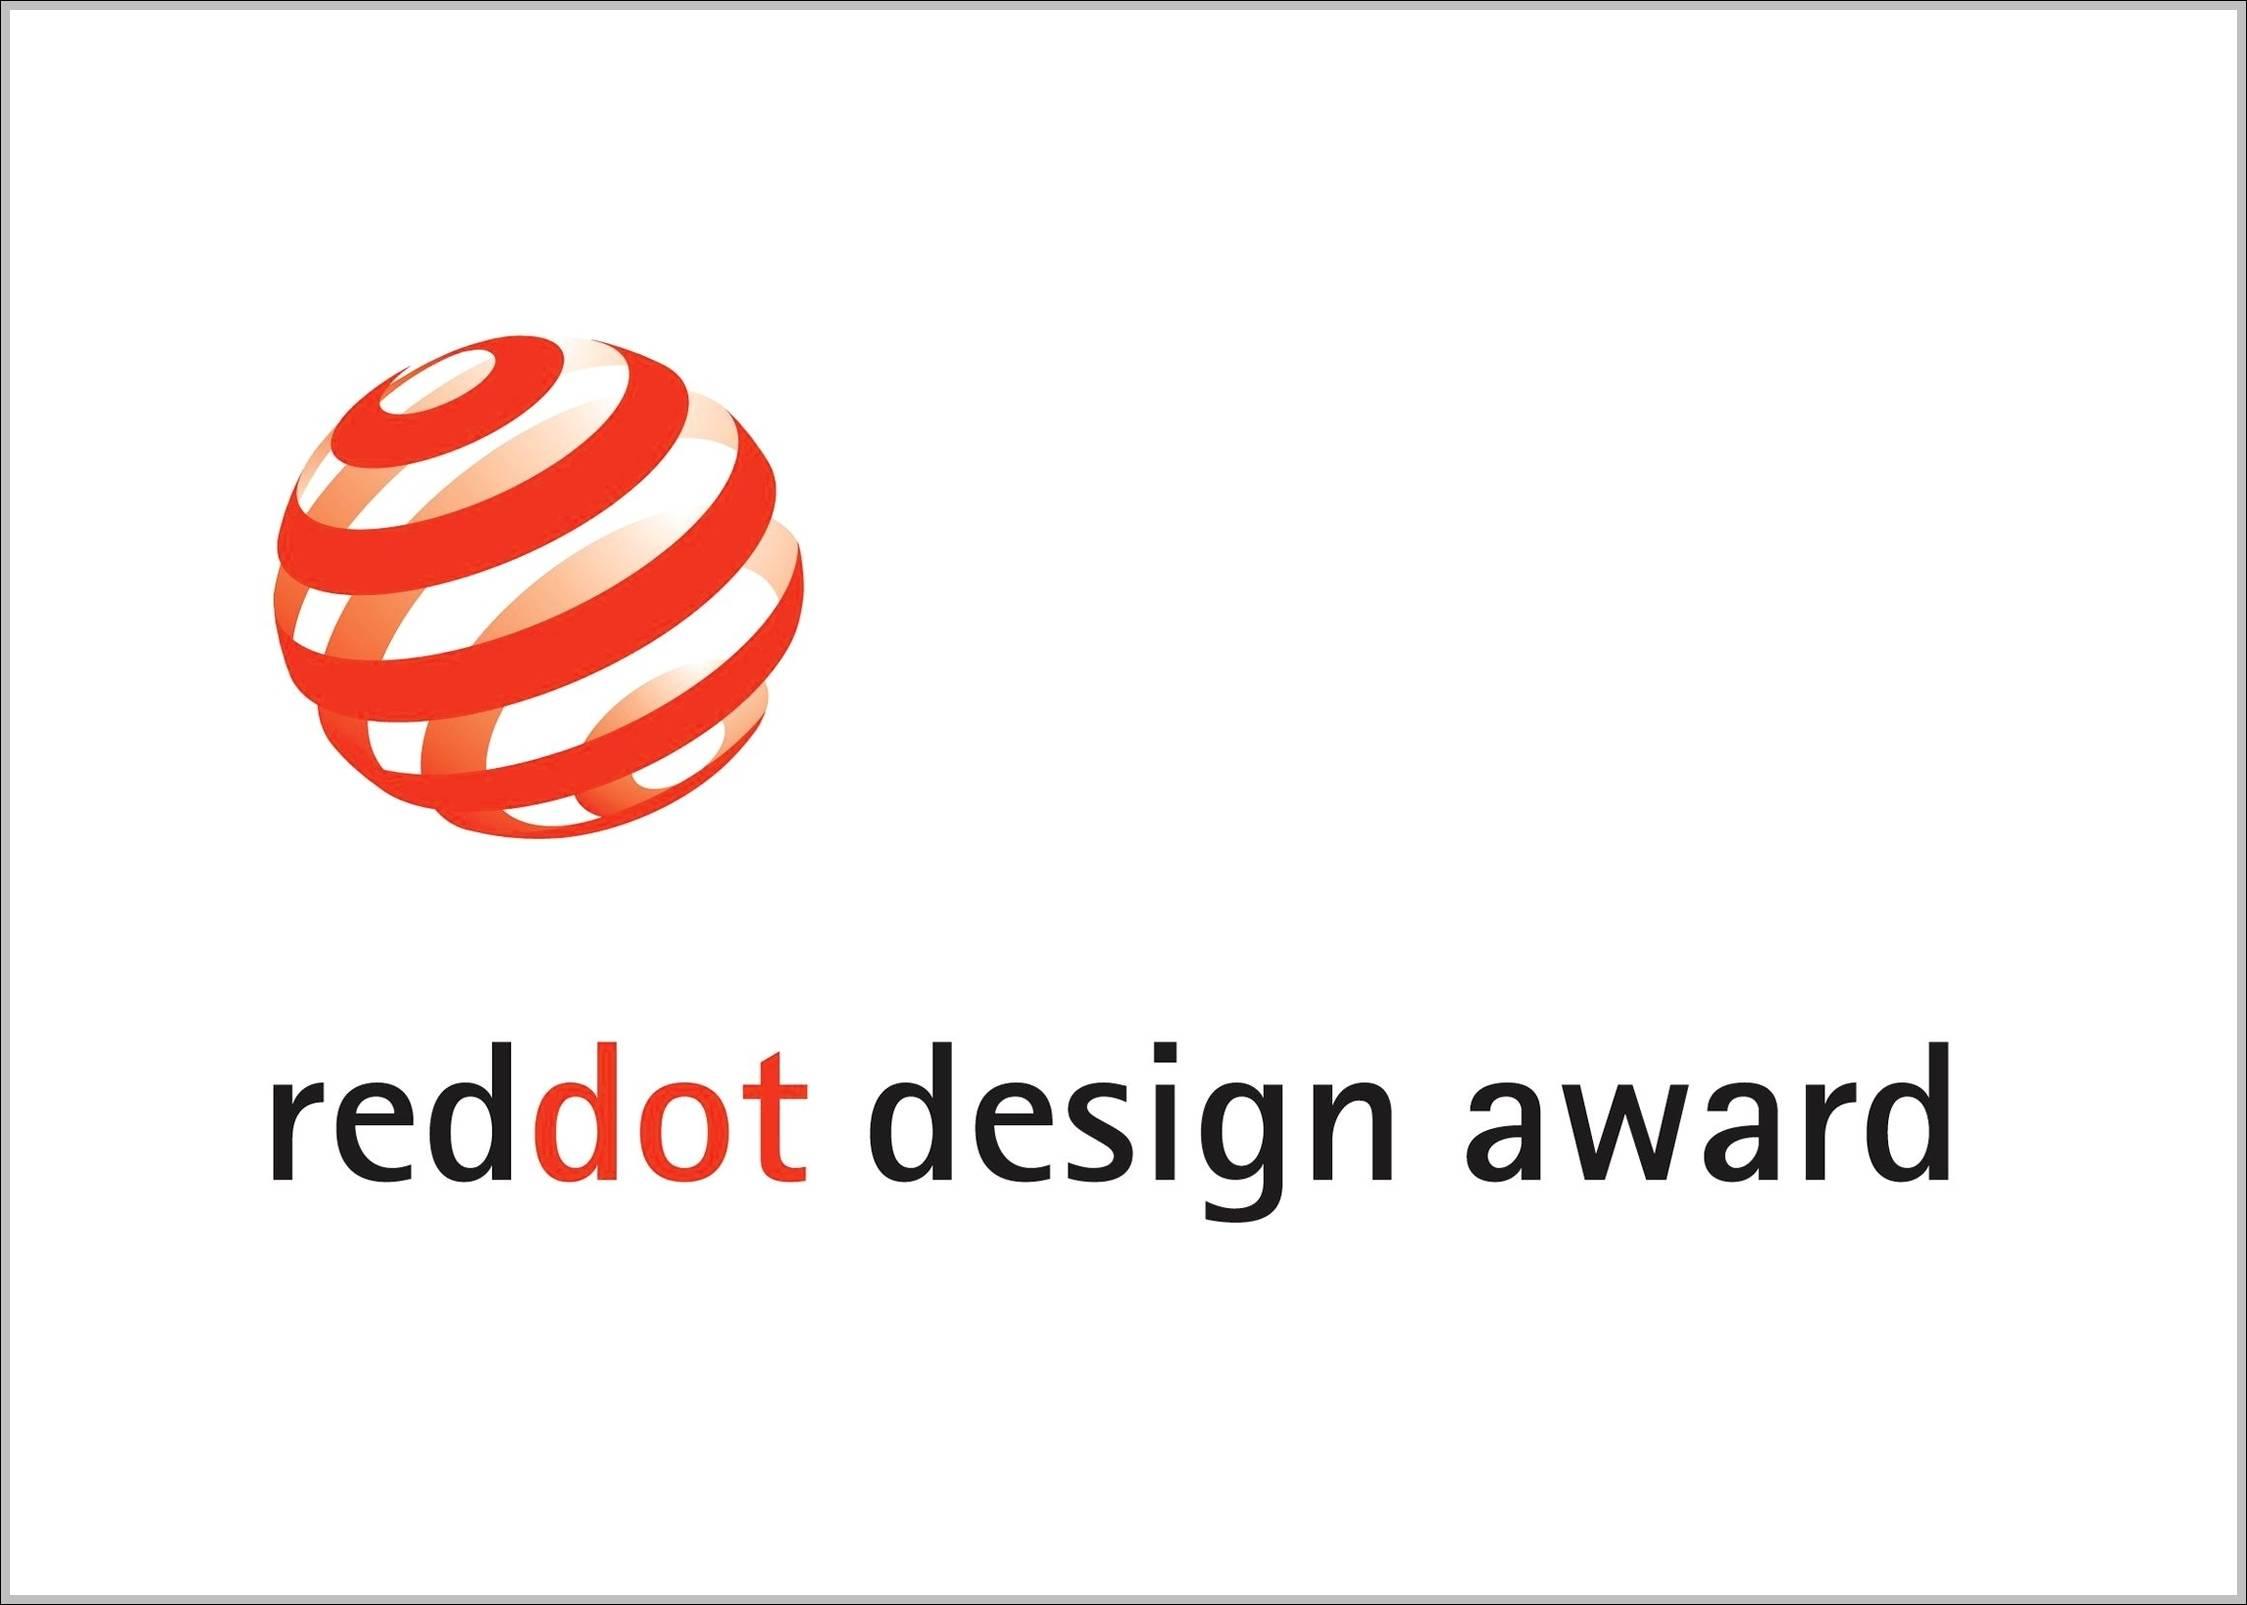 RedDot Design Award logo